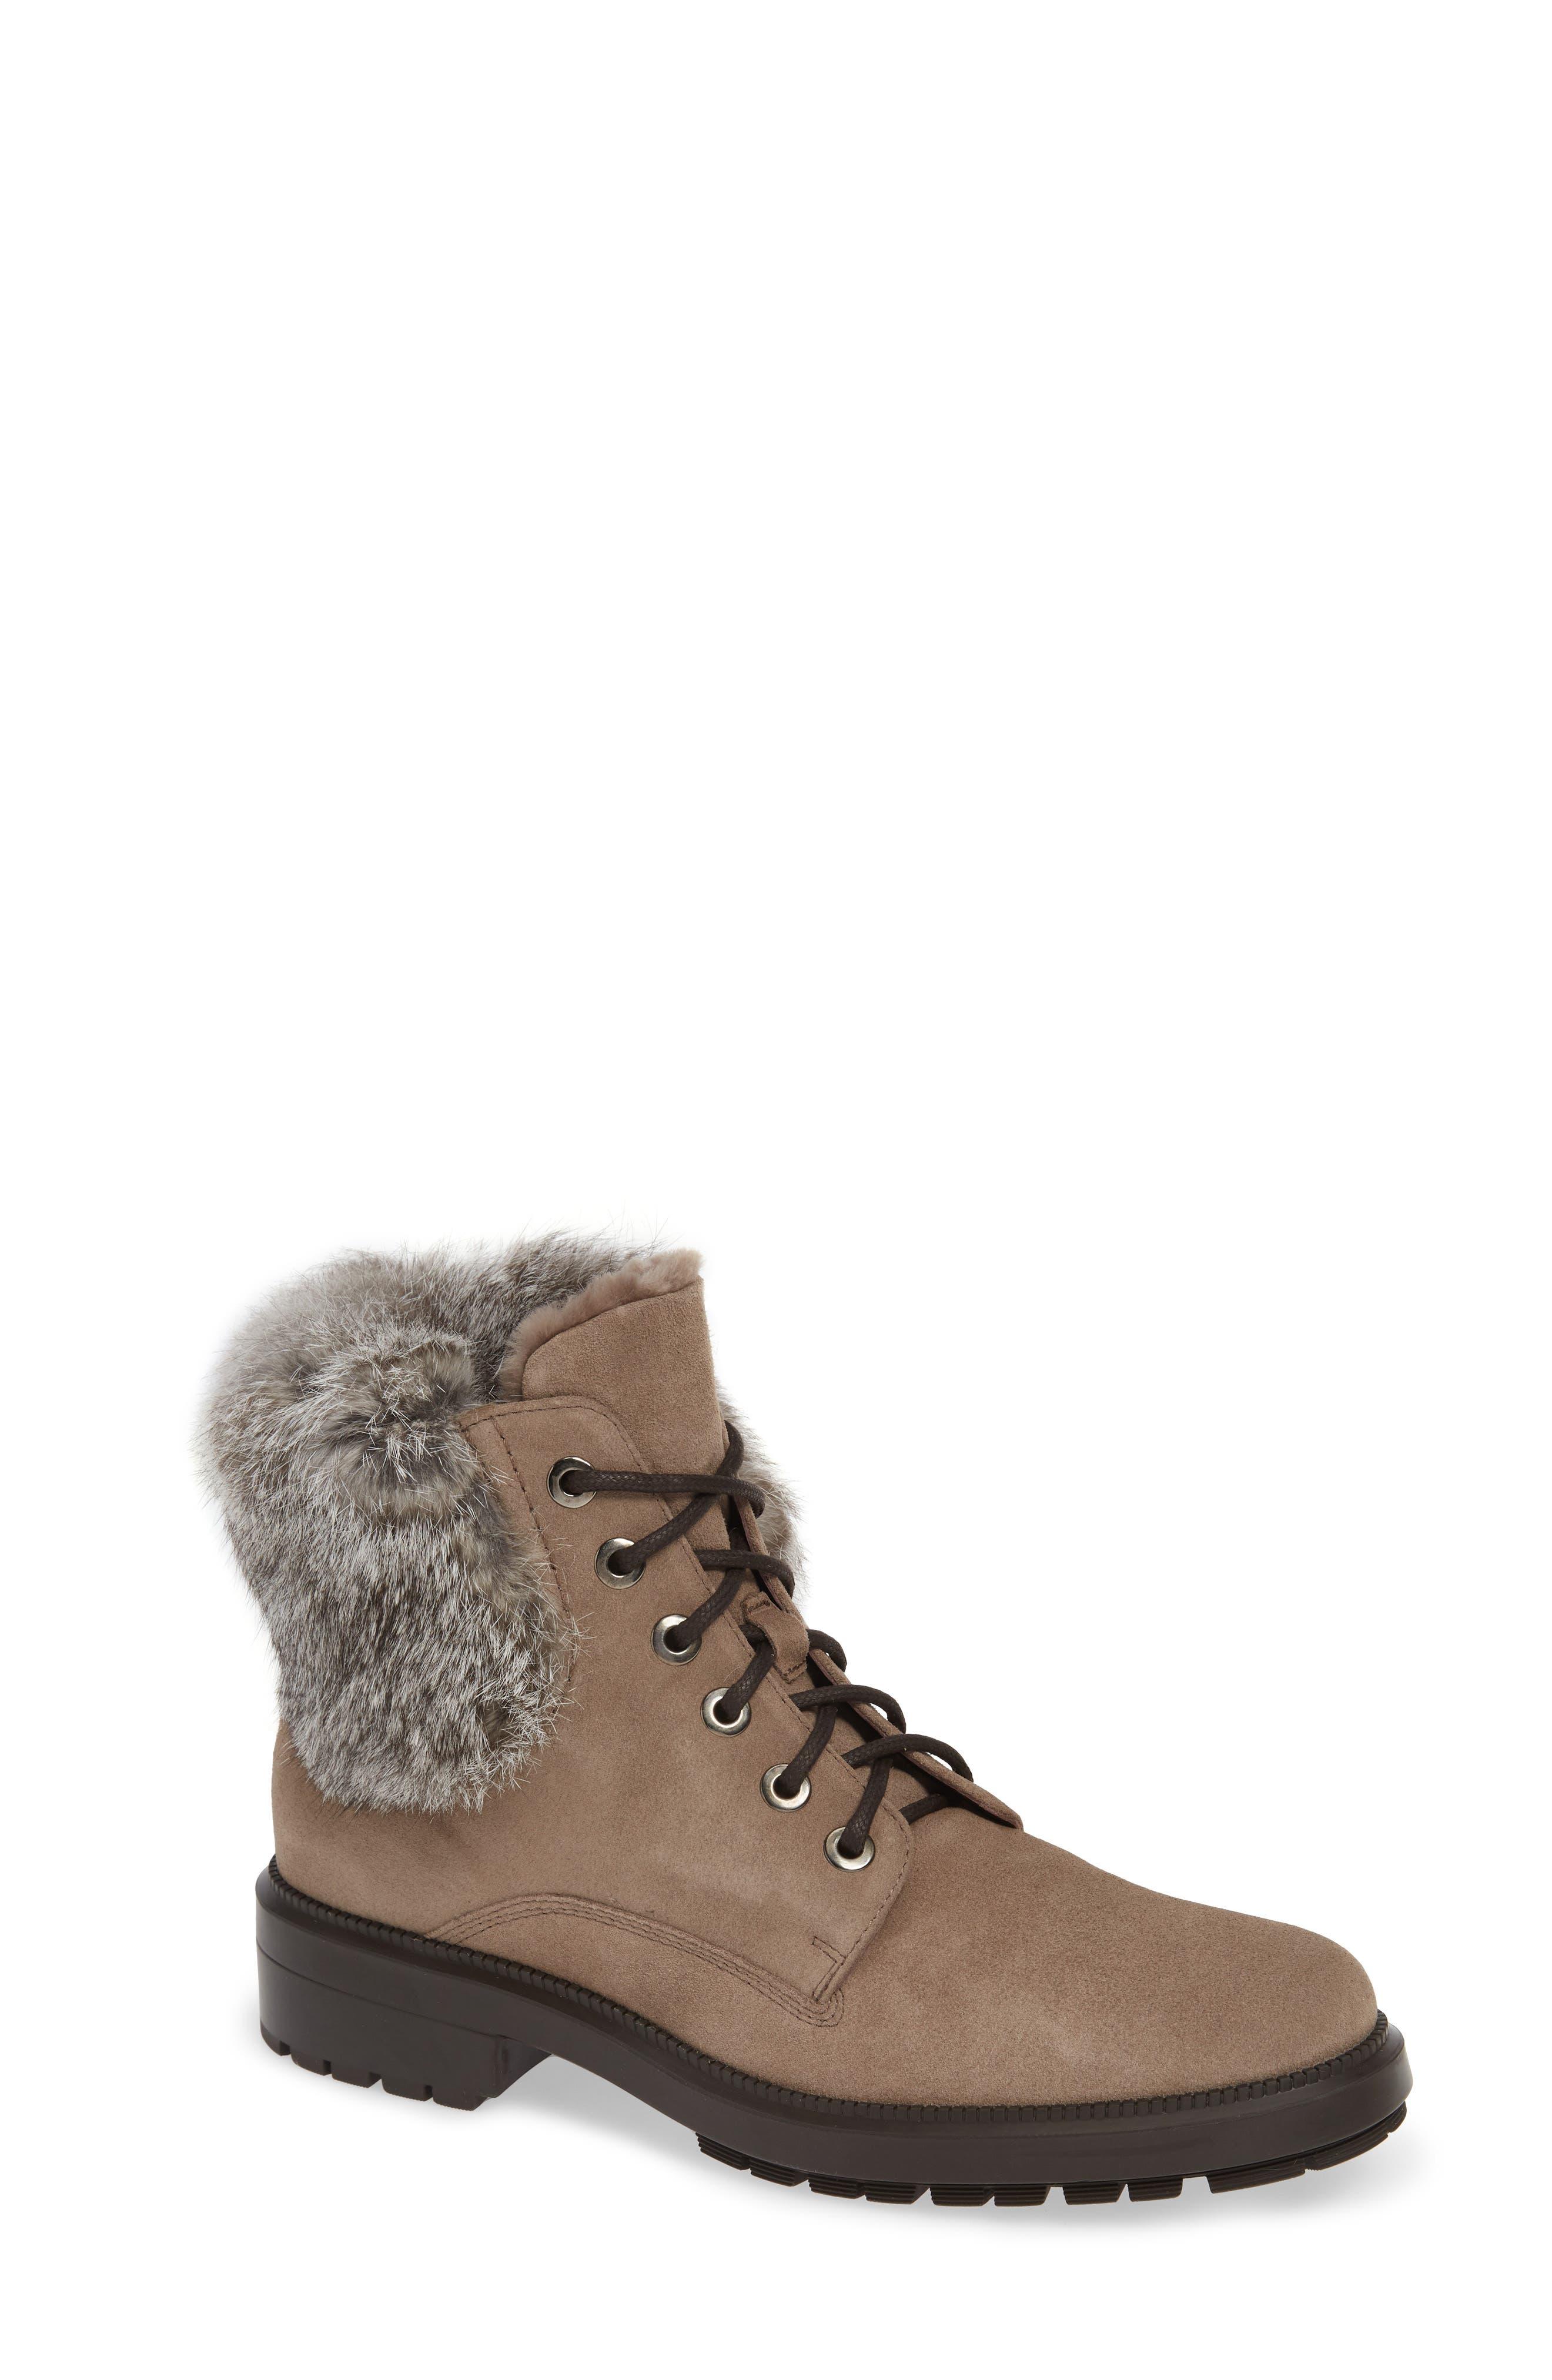 Aquatalia Lacy Genuine Shearling Lined Boot With Genuine Rabbit Fur Trim, Beige